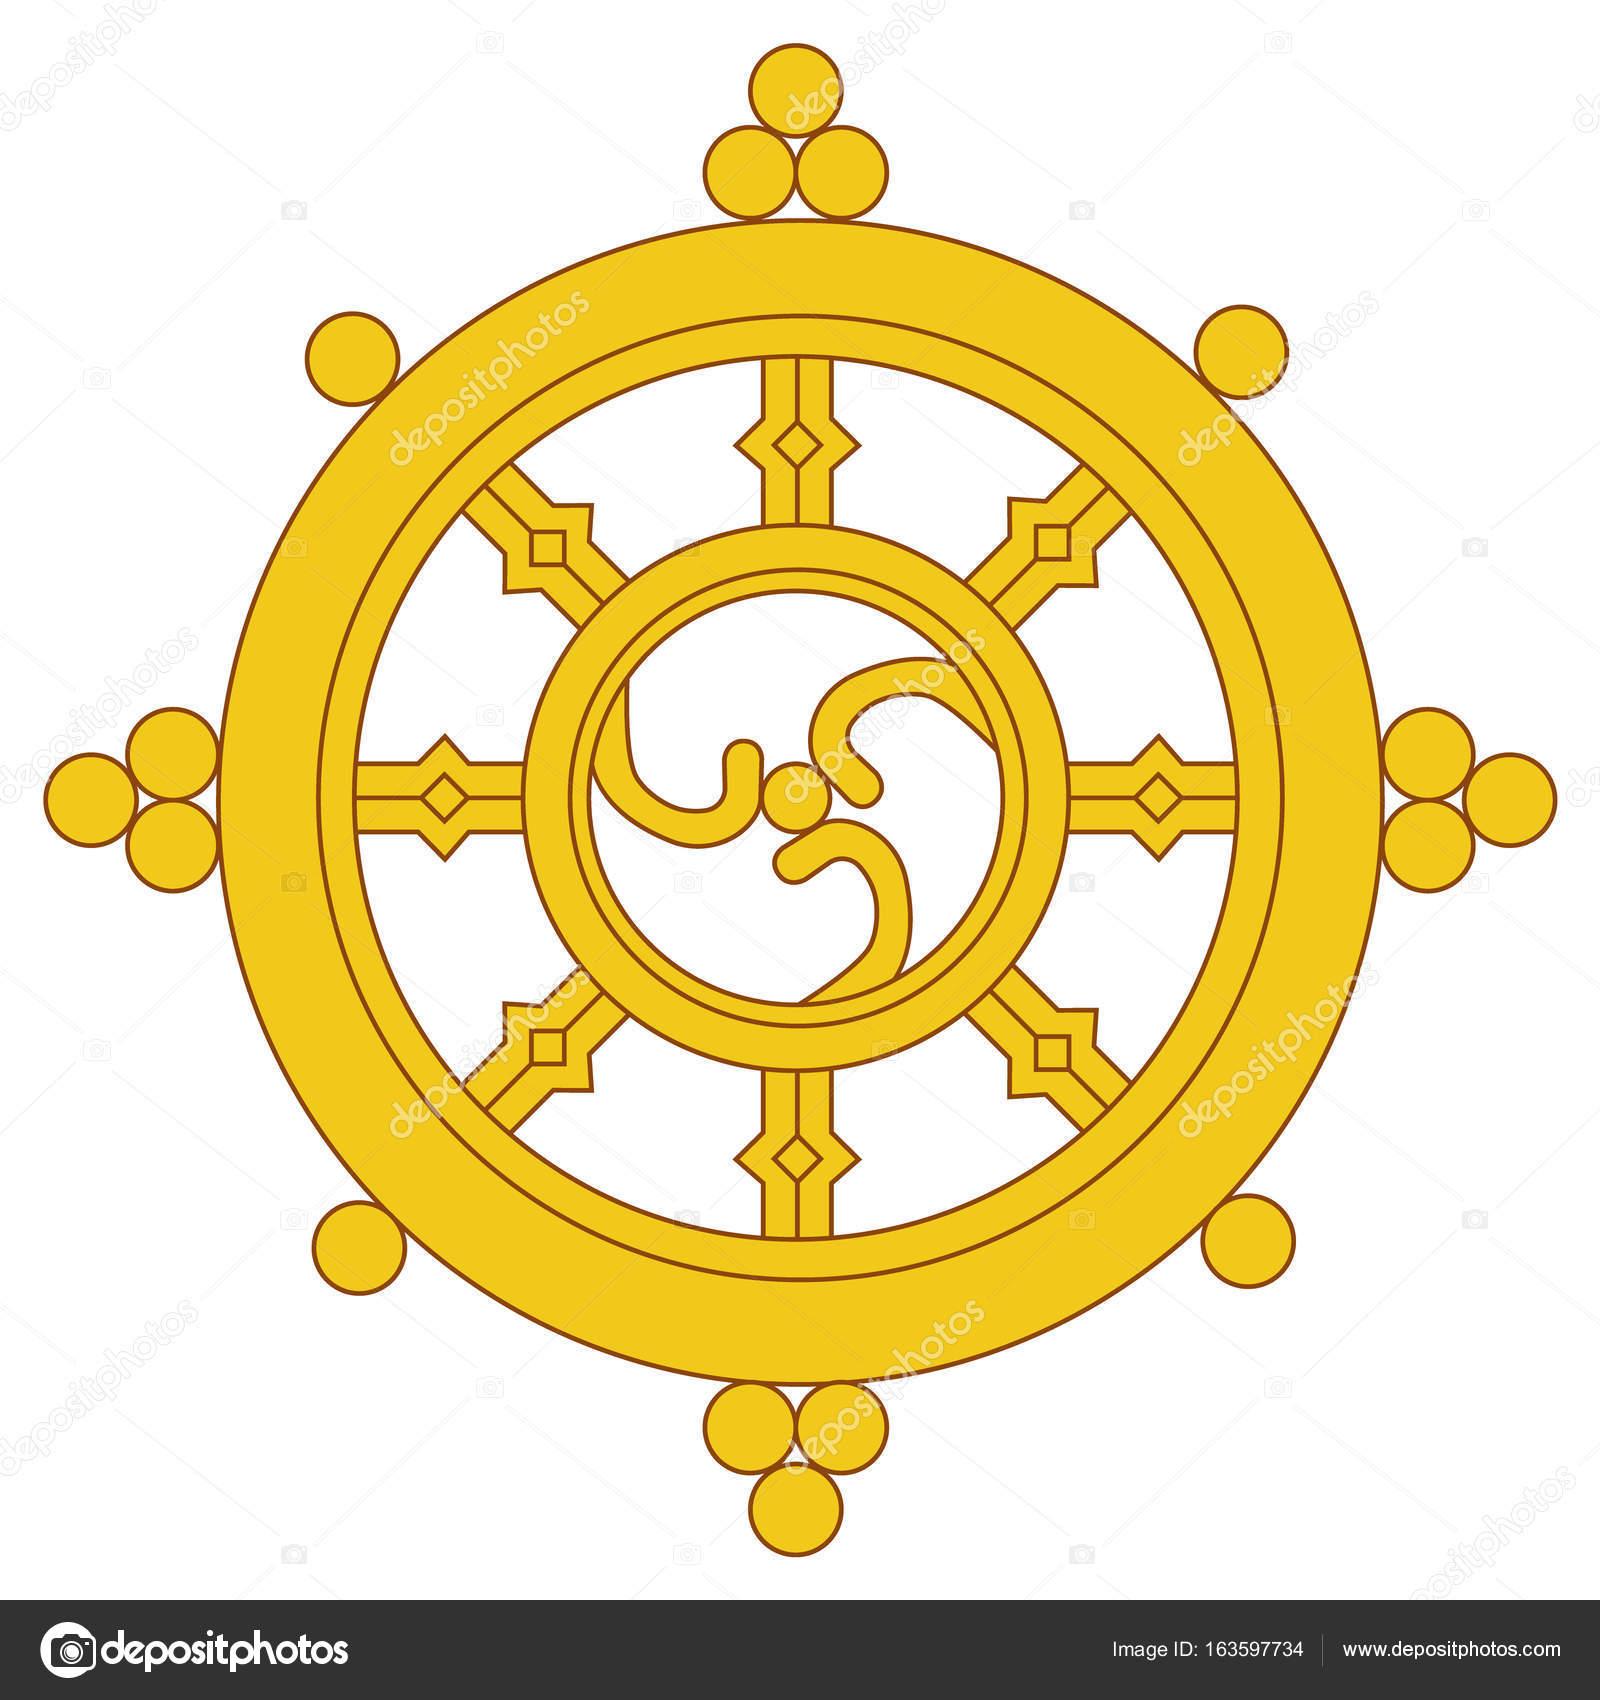 Dharma wheel raster u2014 Stock Photo